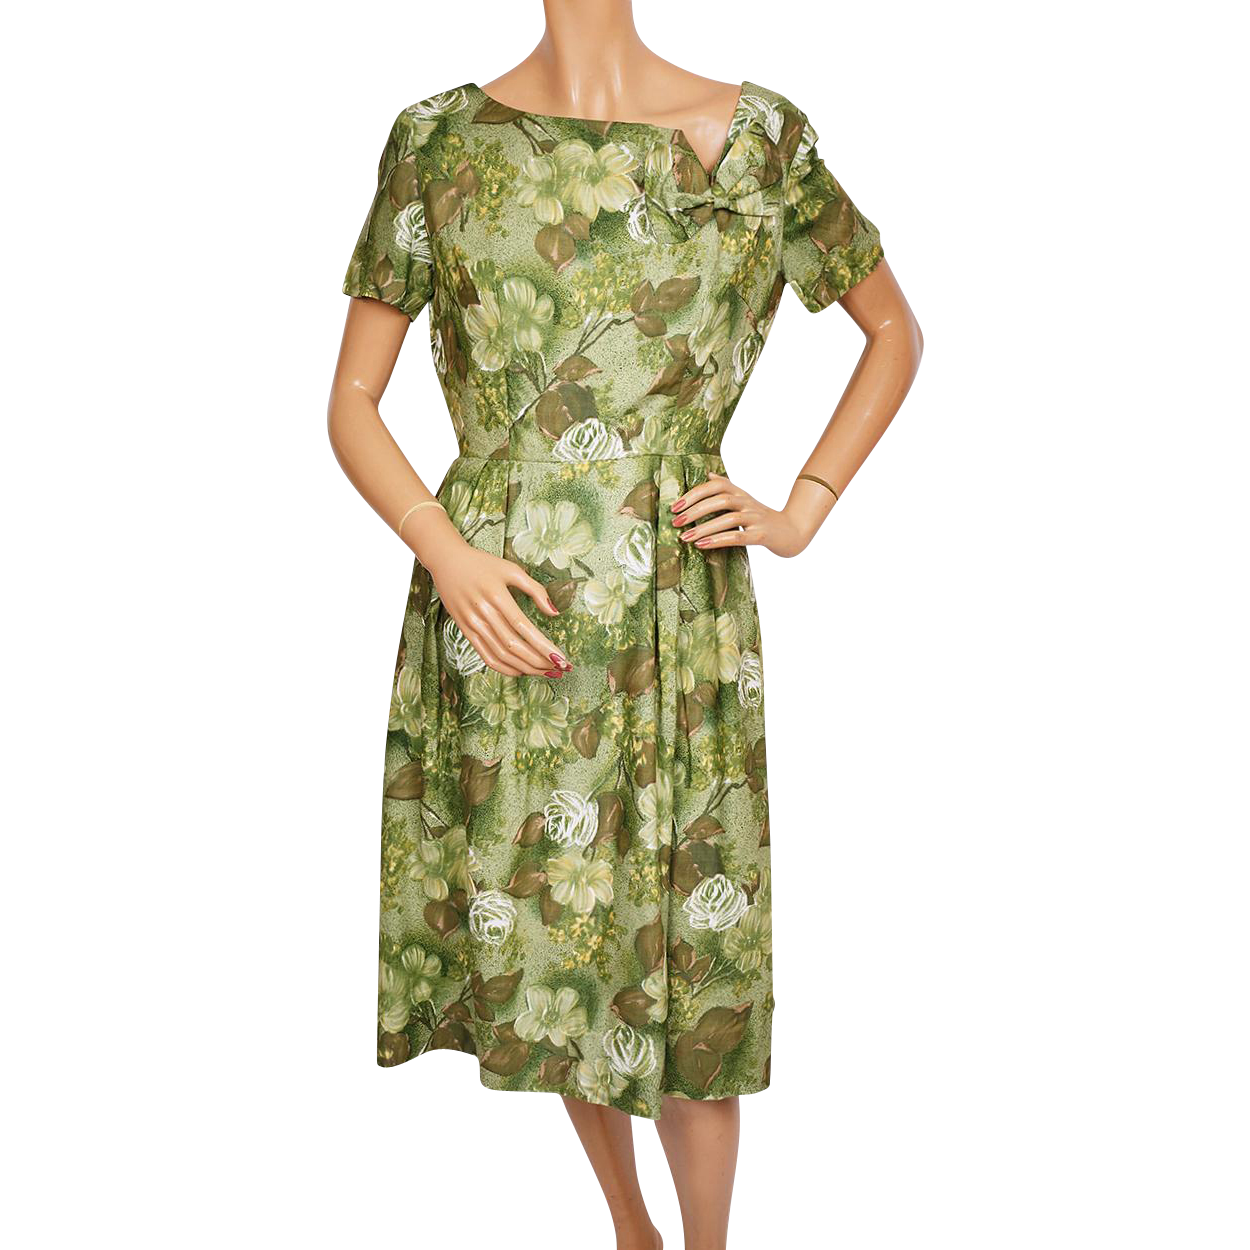 Vintage 60s Green Floral Print Cotton Dress Size M Medium